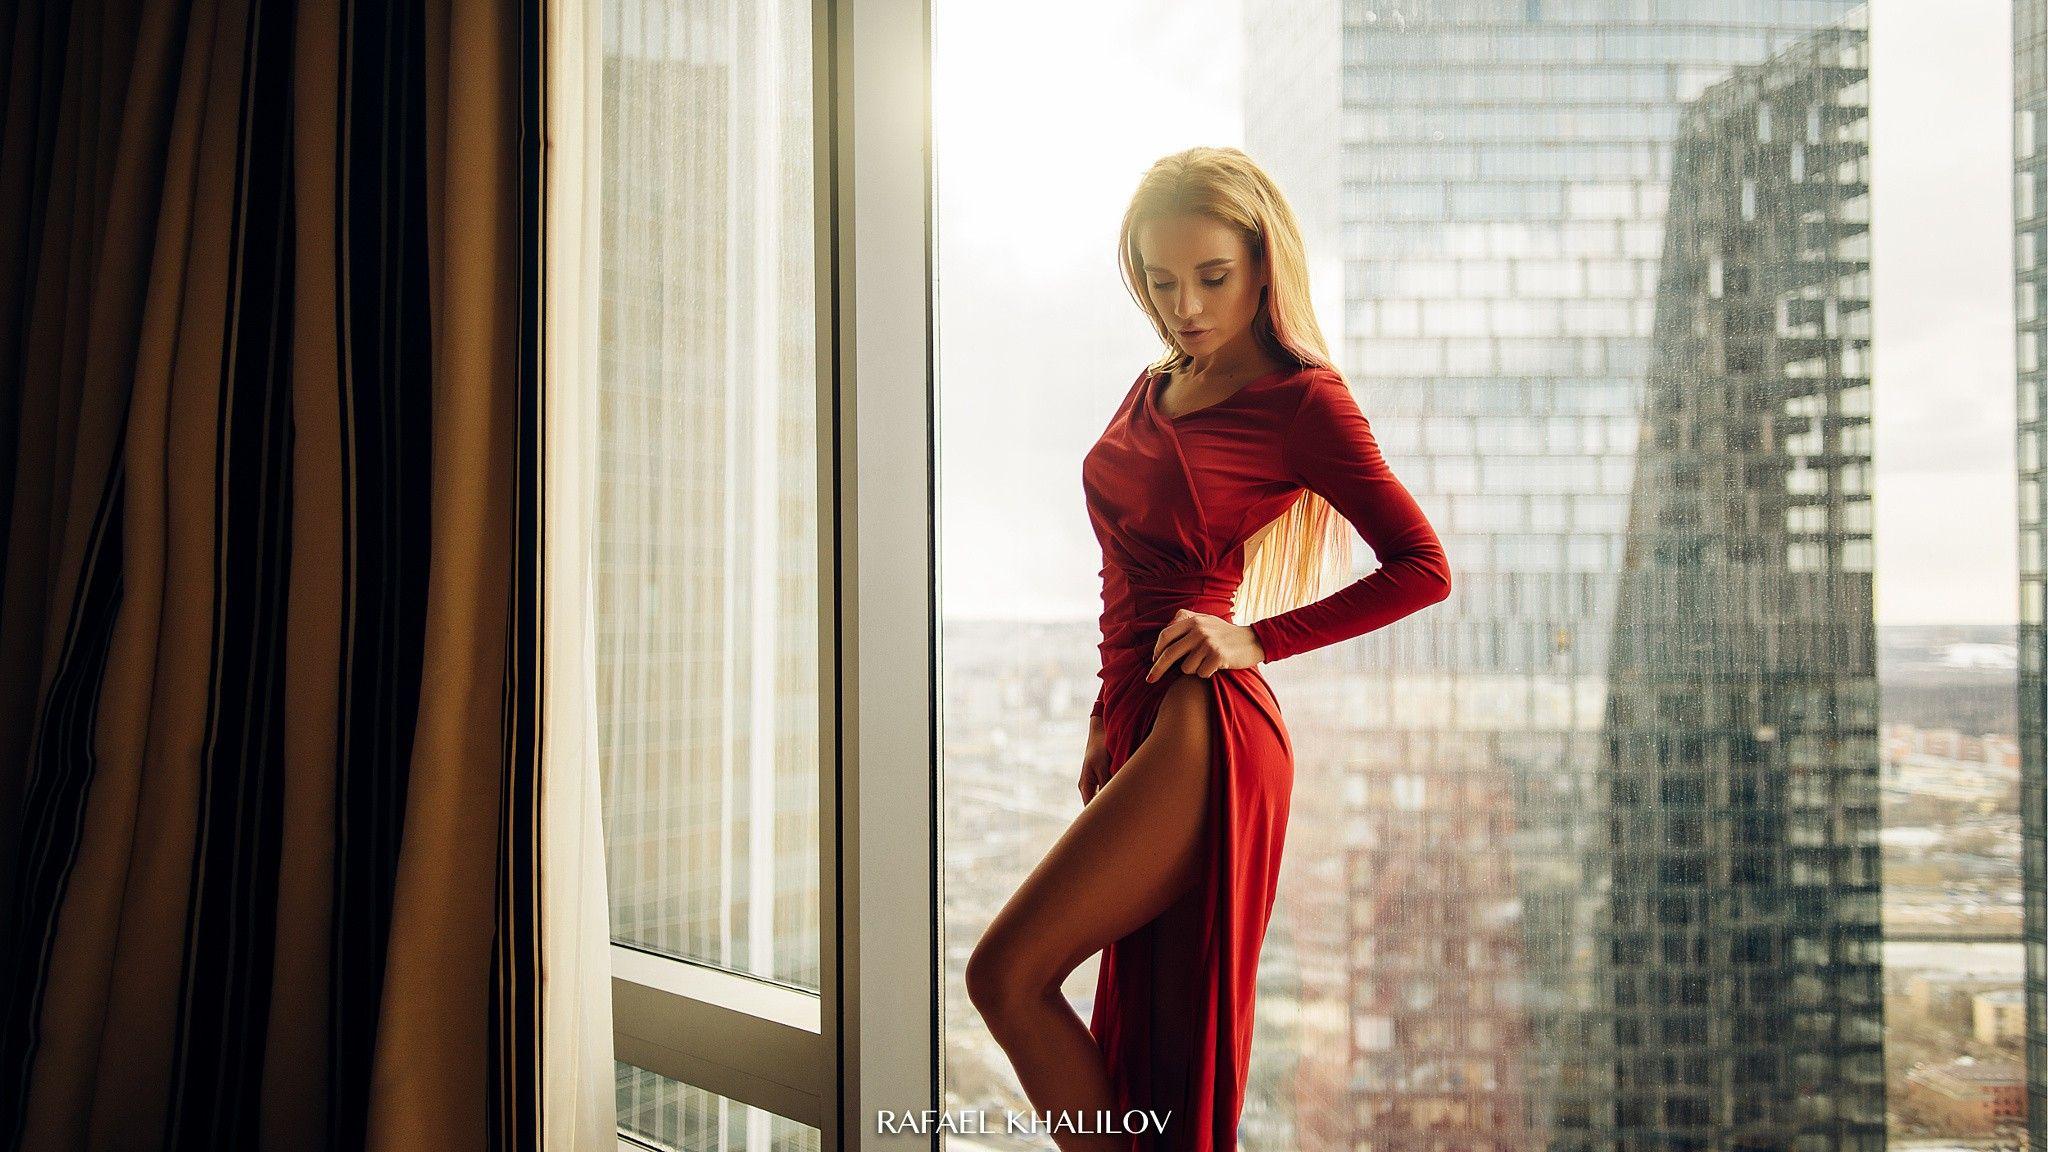 Sideboobs Ekaterina Zueva nude (39 photo), Pussy, Cleavage, Twitter, swimsuit 2020